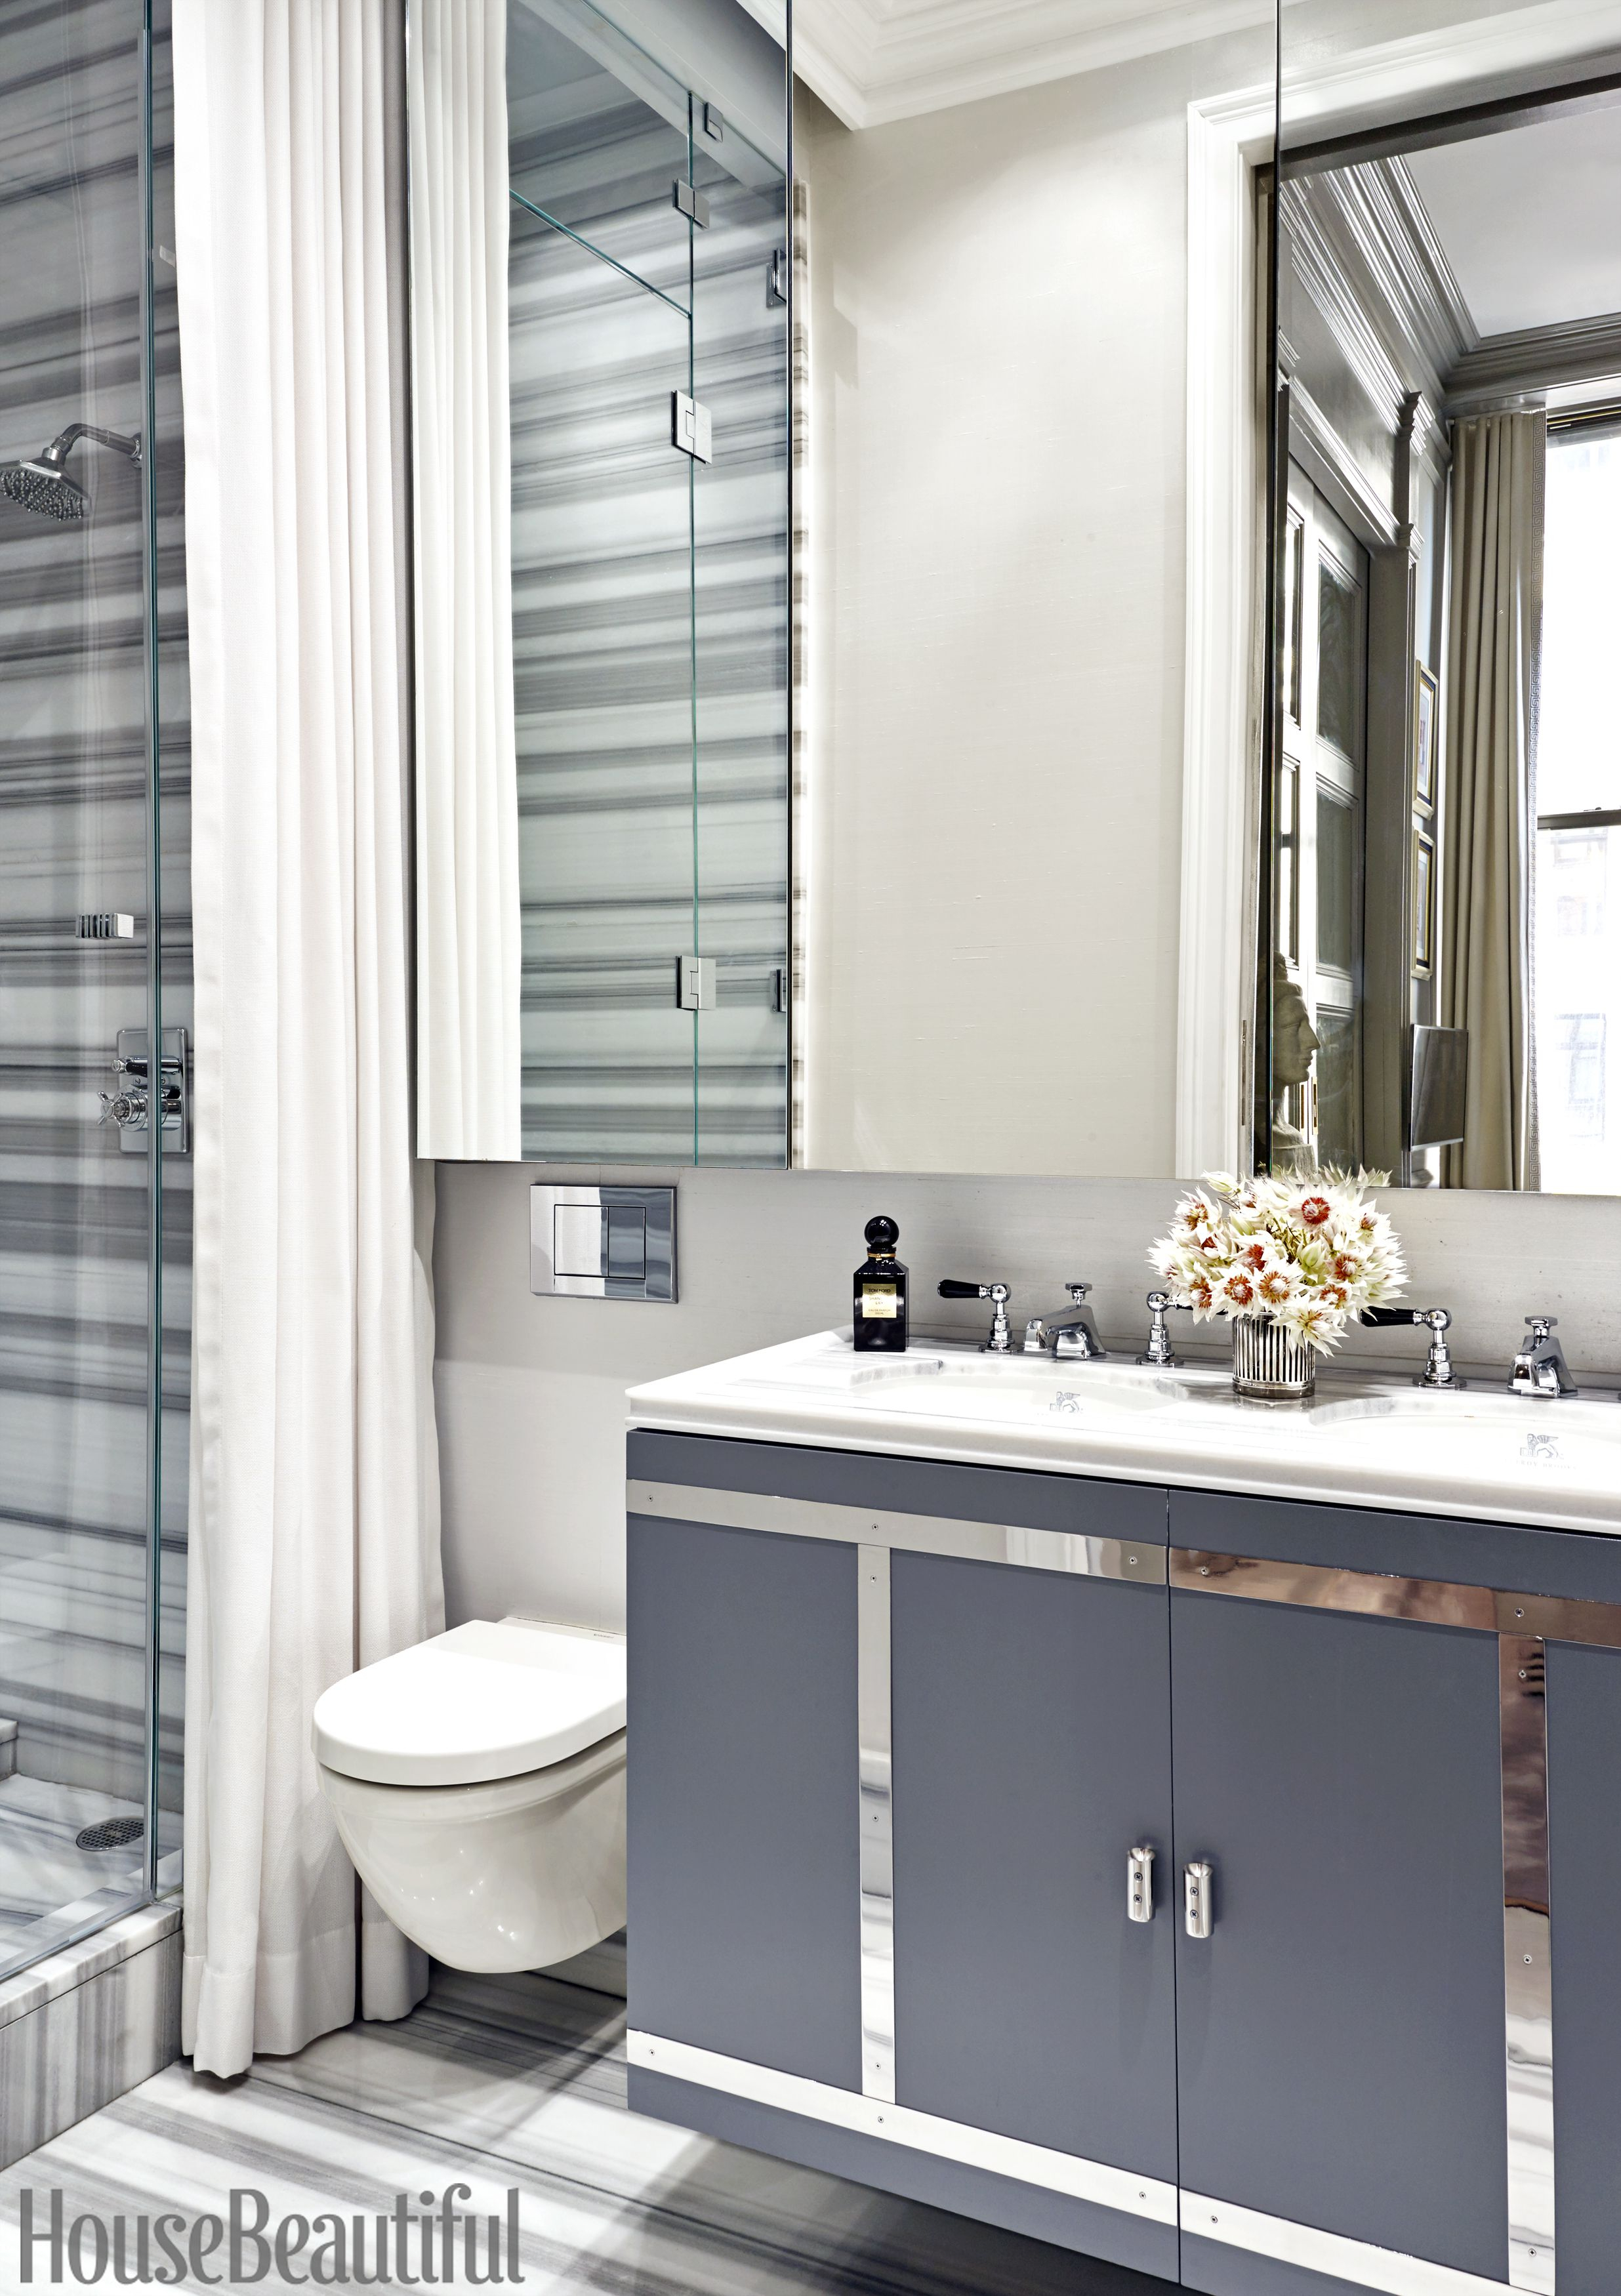 30 Small Bathroom Design Ideas Small Bathroom Solutions inside measurements 2471 X 3500